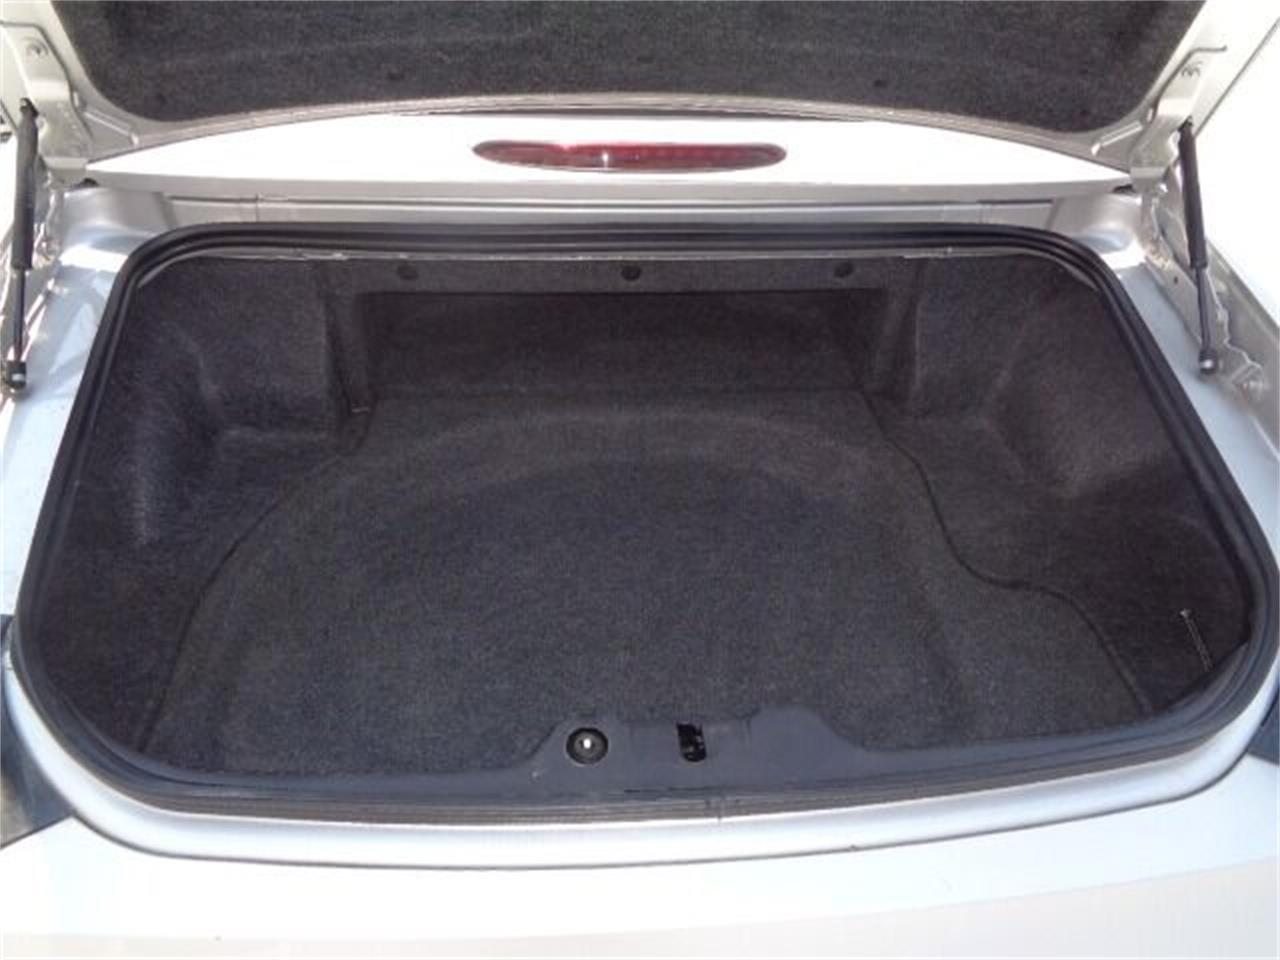 2005 Ford Thunderbird (CC-1364135) for sale in Staunton, Illinois